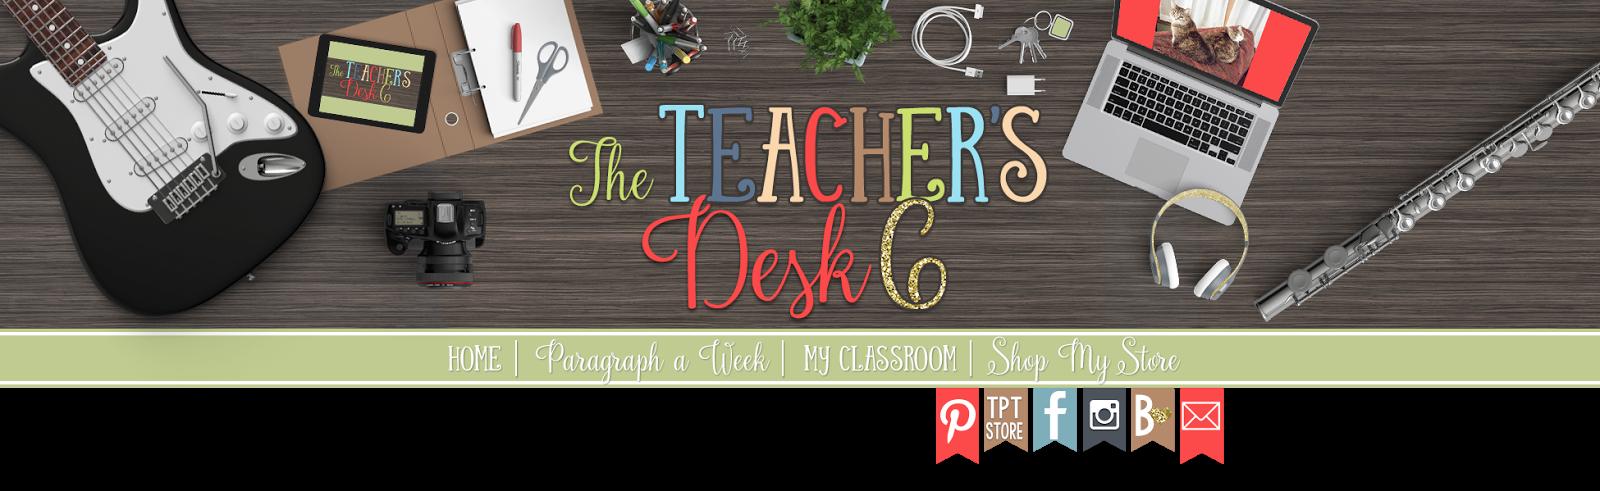 teacher day celebration essay